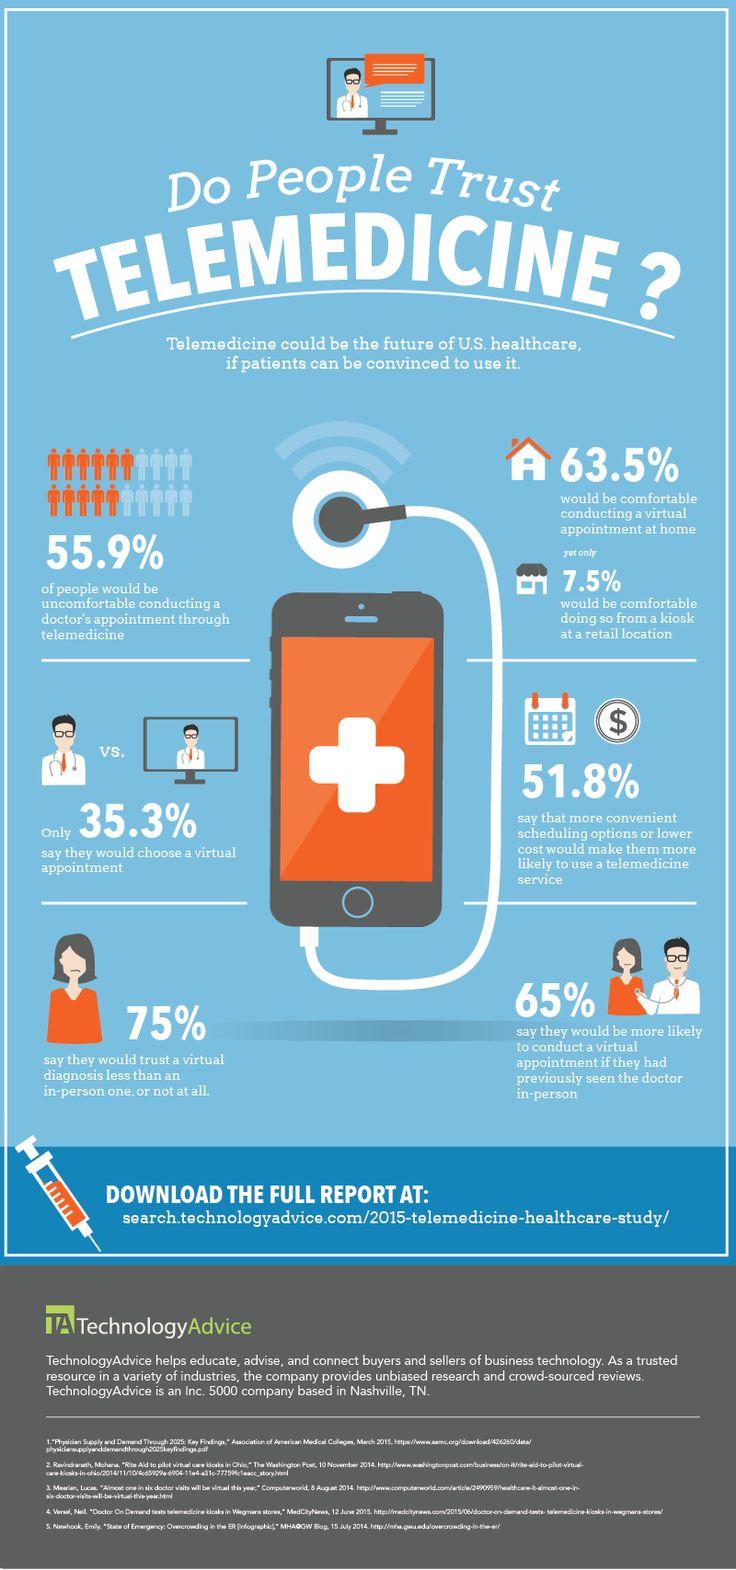 Do People Trust Telemedicine? (Infographic) Aug 2015